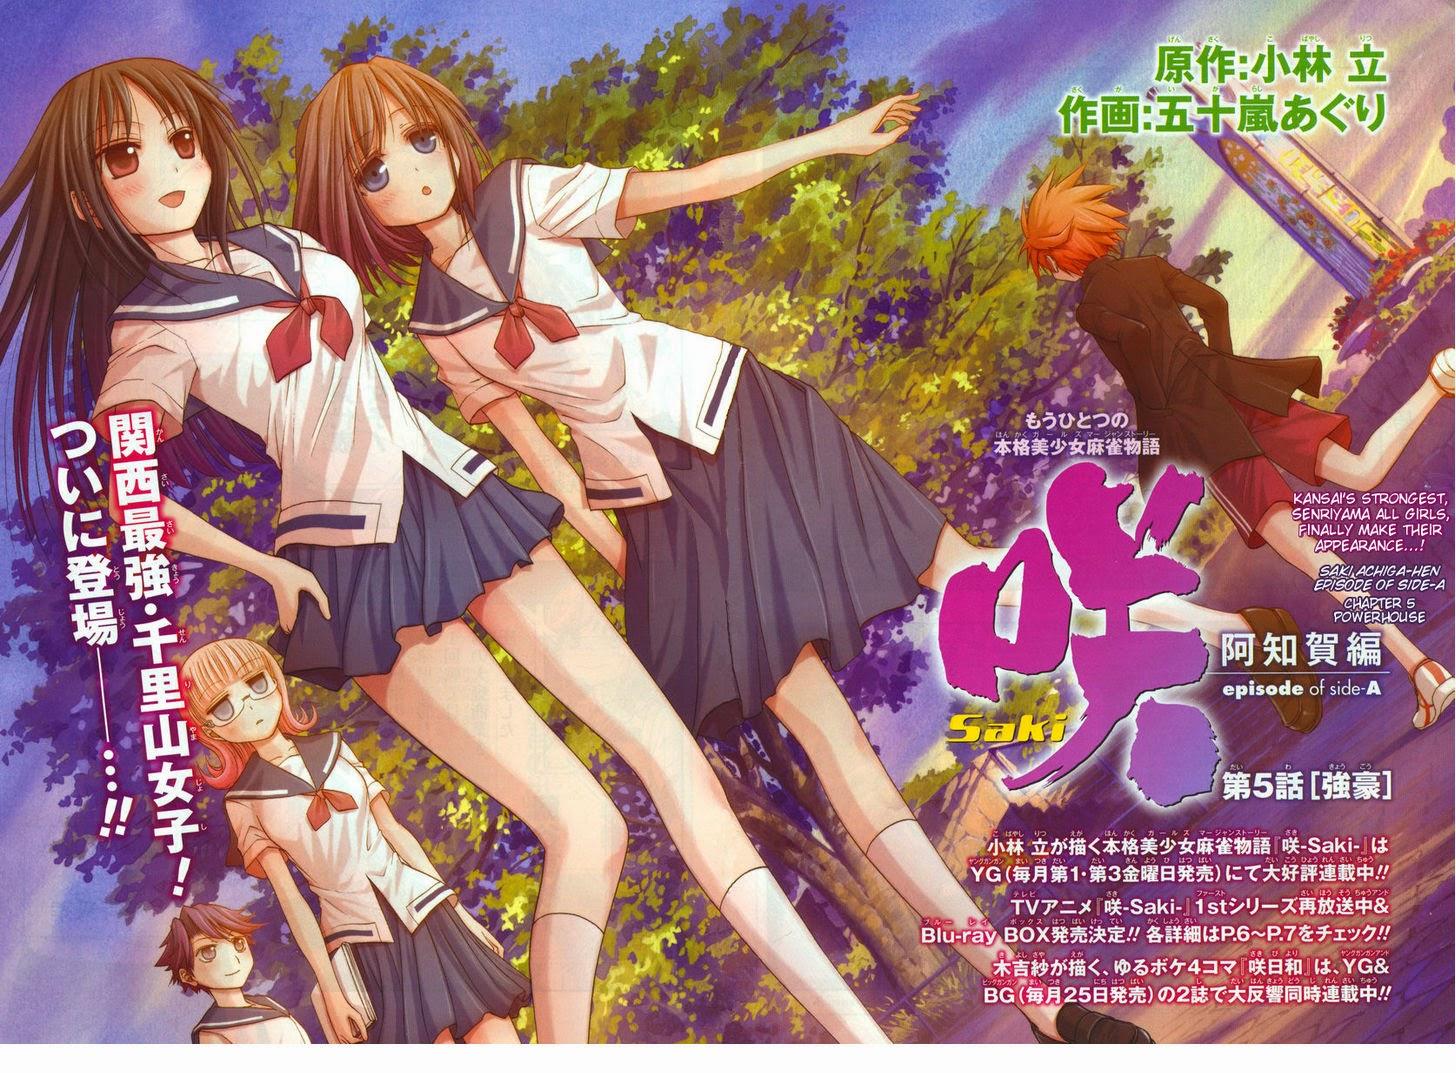 Download Saki: Achiga-hen – Episode of Side-A BD Subtitle Indonesia (Complete)